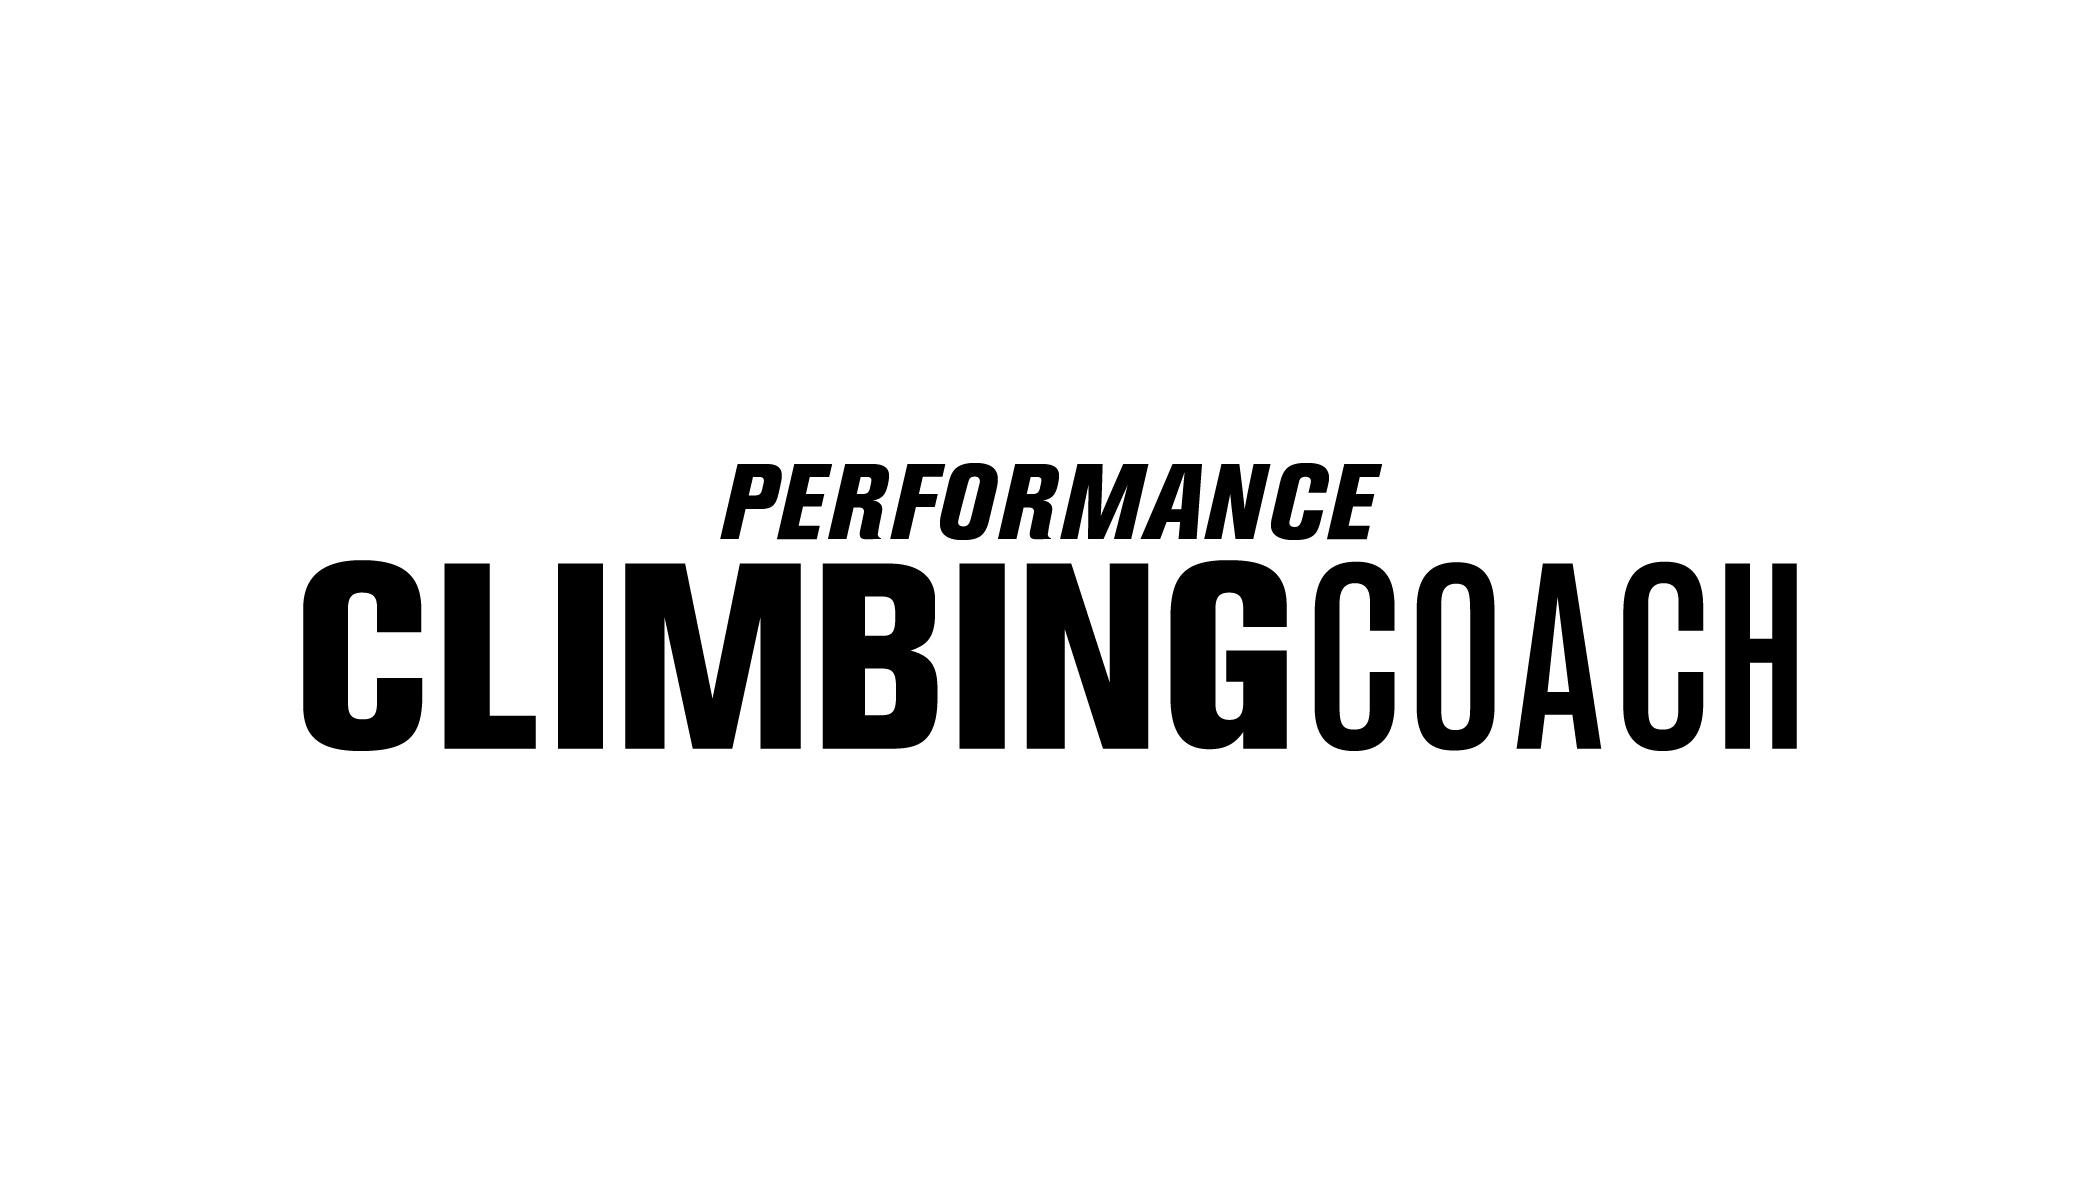 Performance Climbing Coach grey